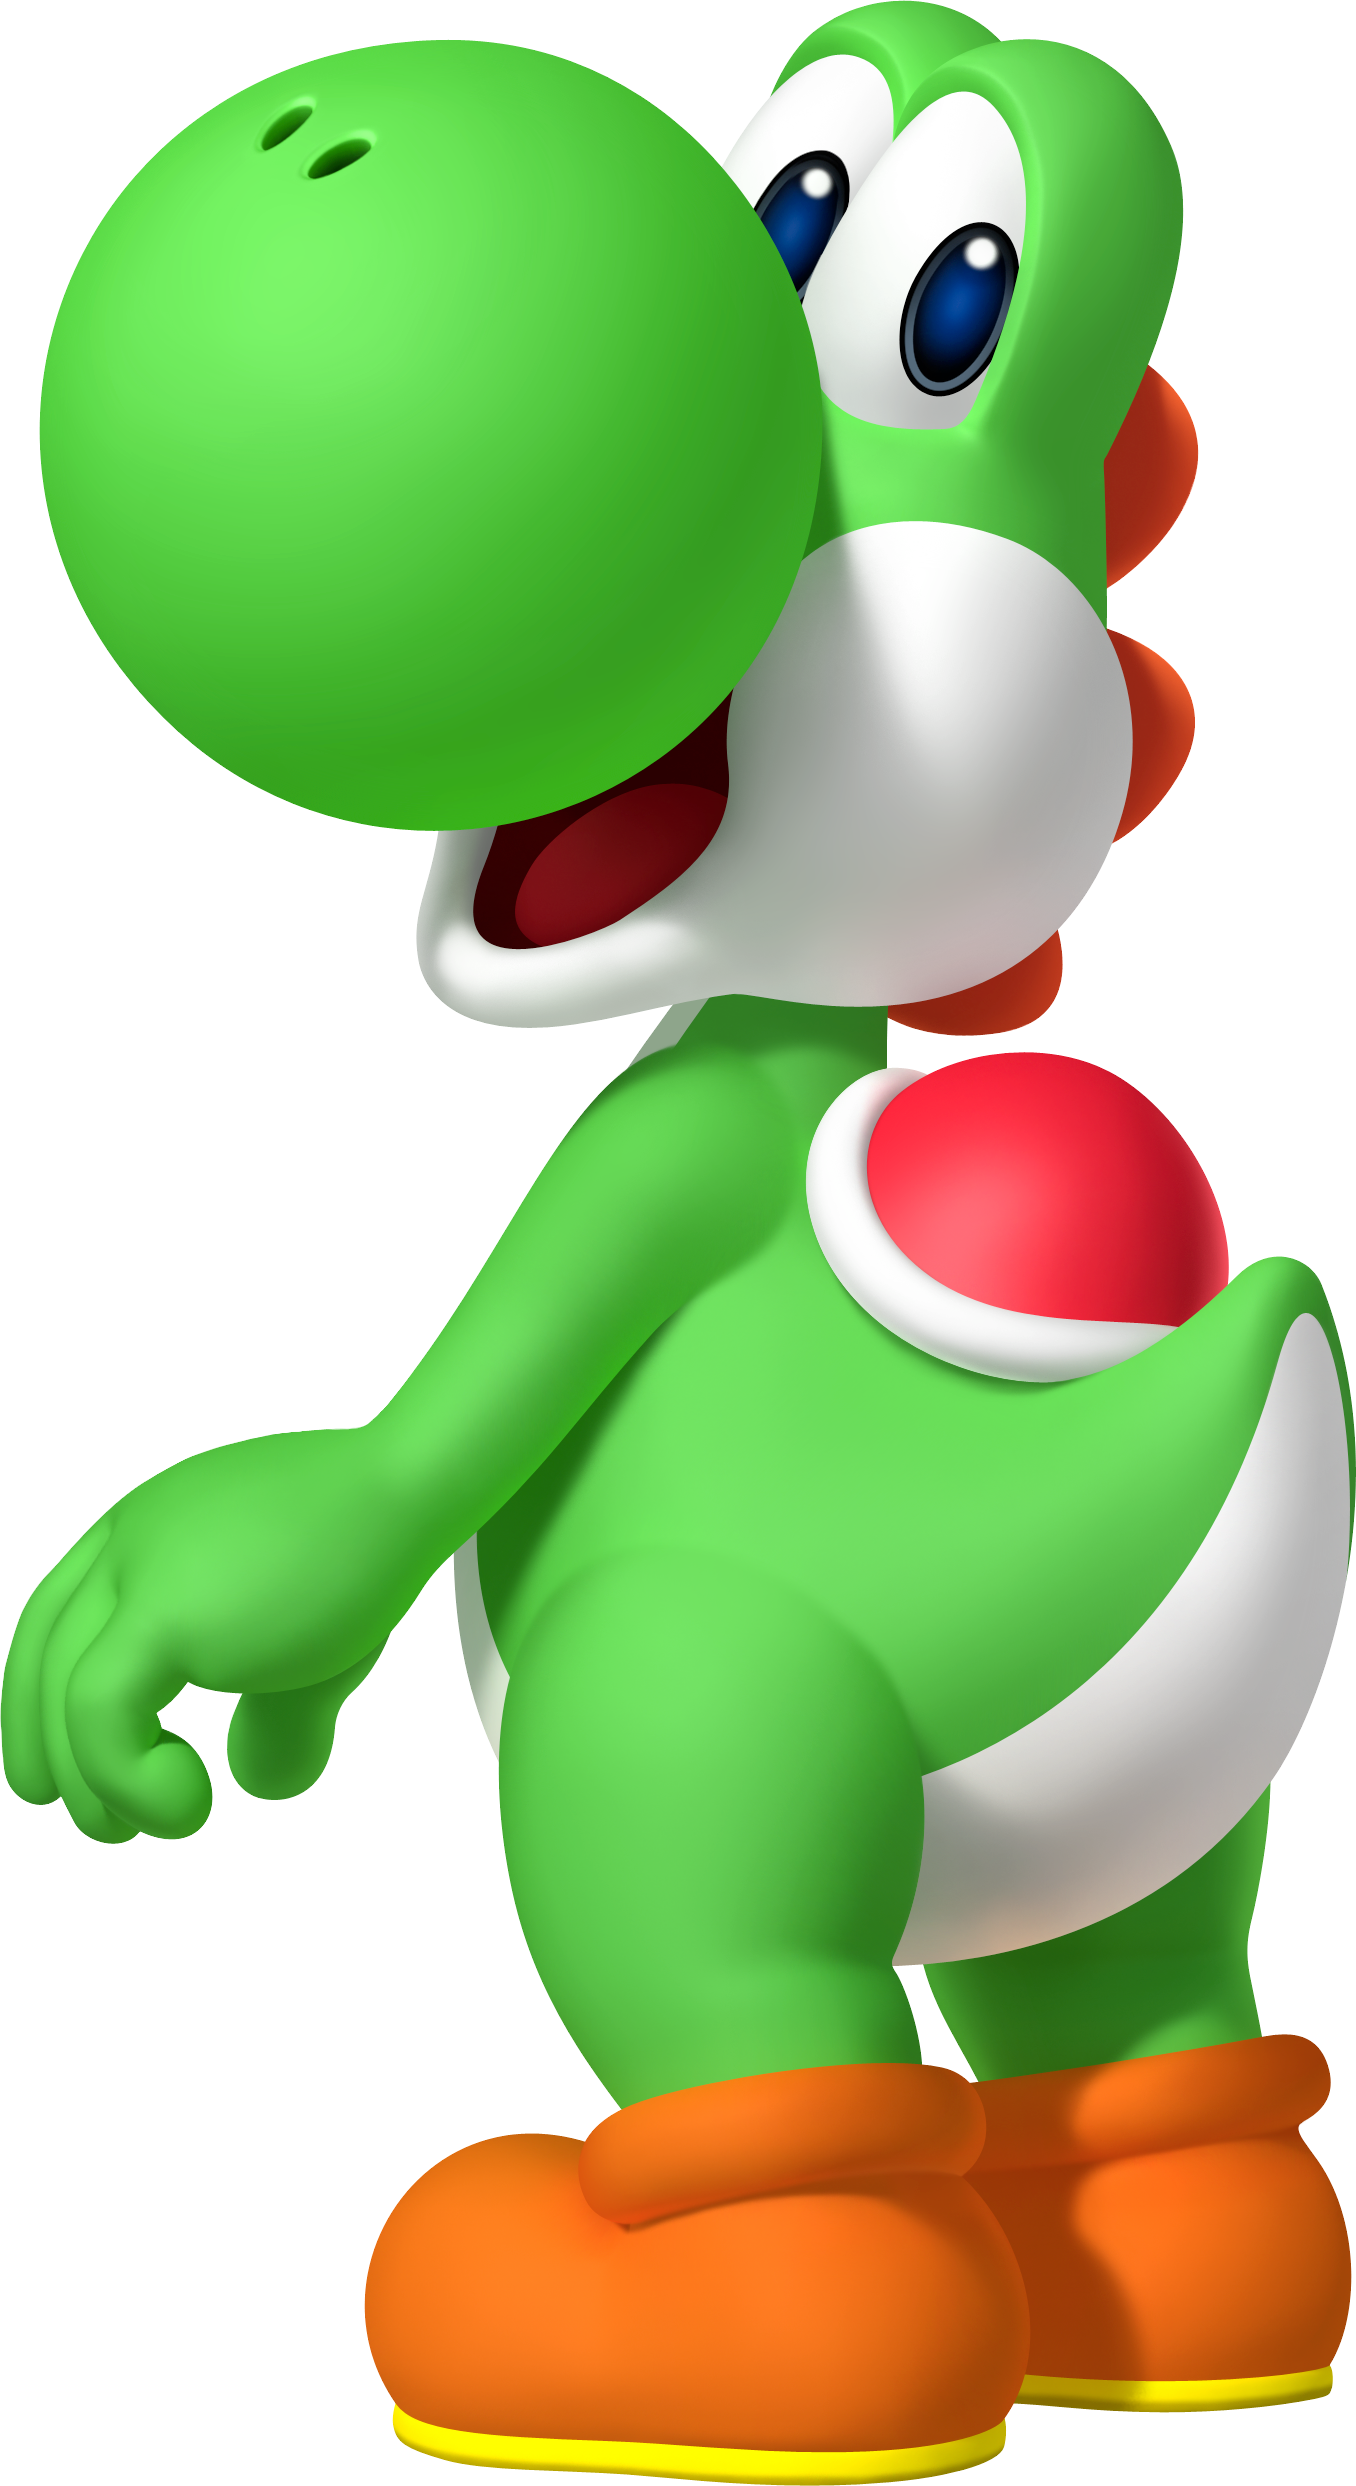 File:Yoshi Artwork - Mario Party Island Tour.png | Purim ... | 1356 x 2486 png 2102kB